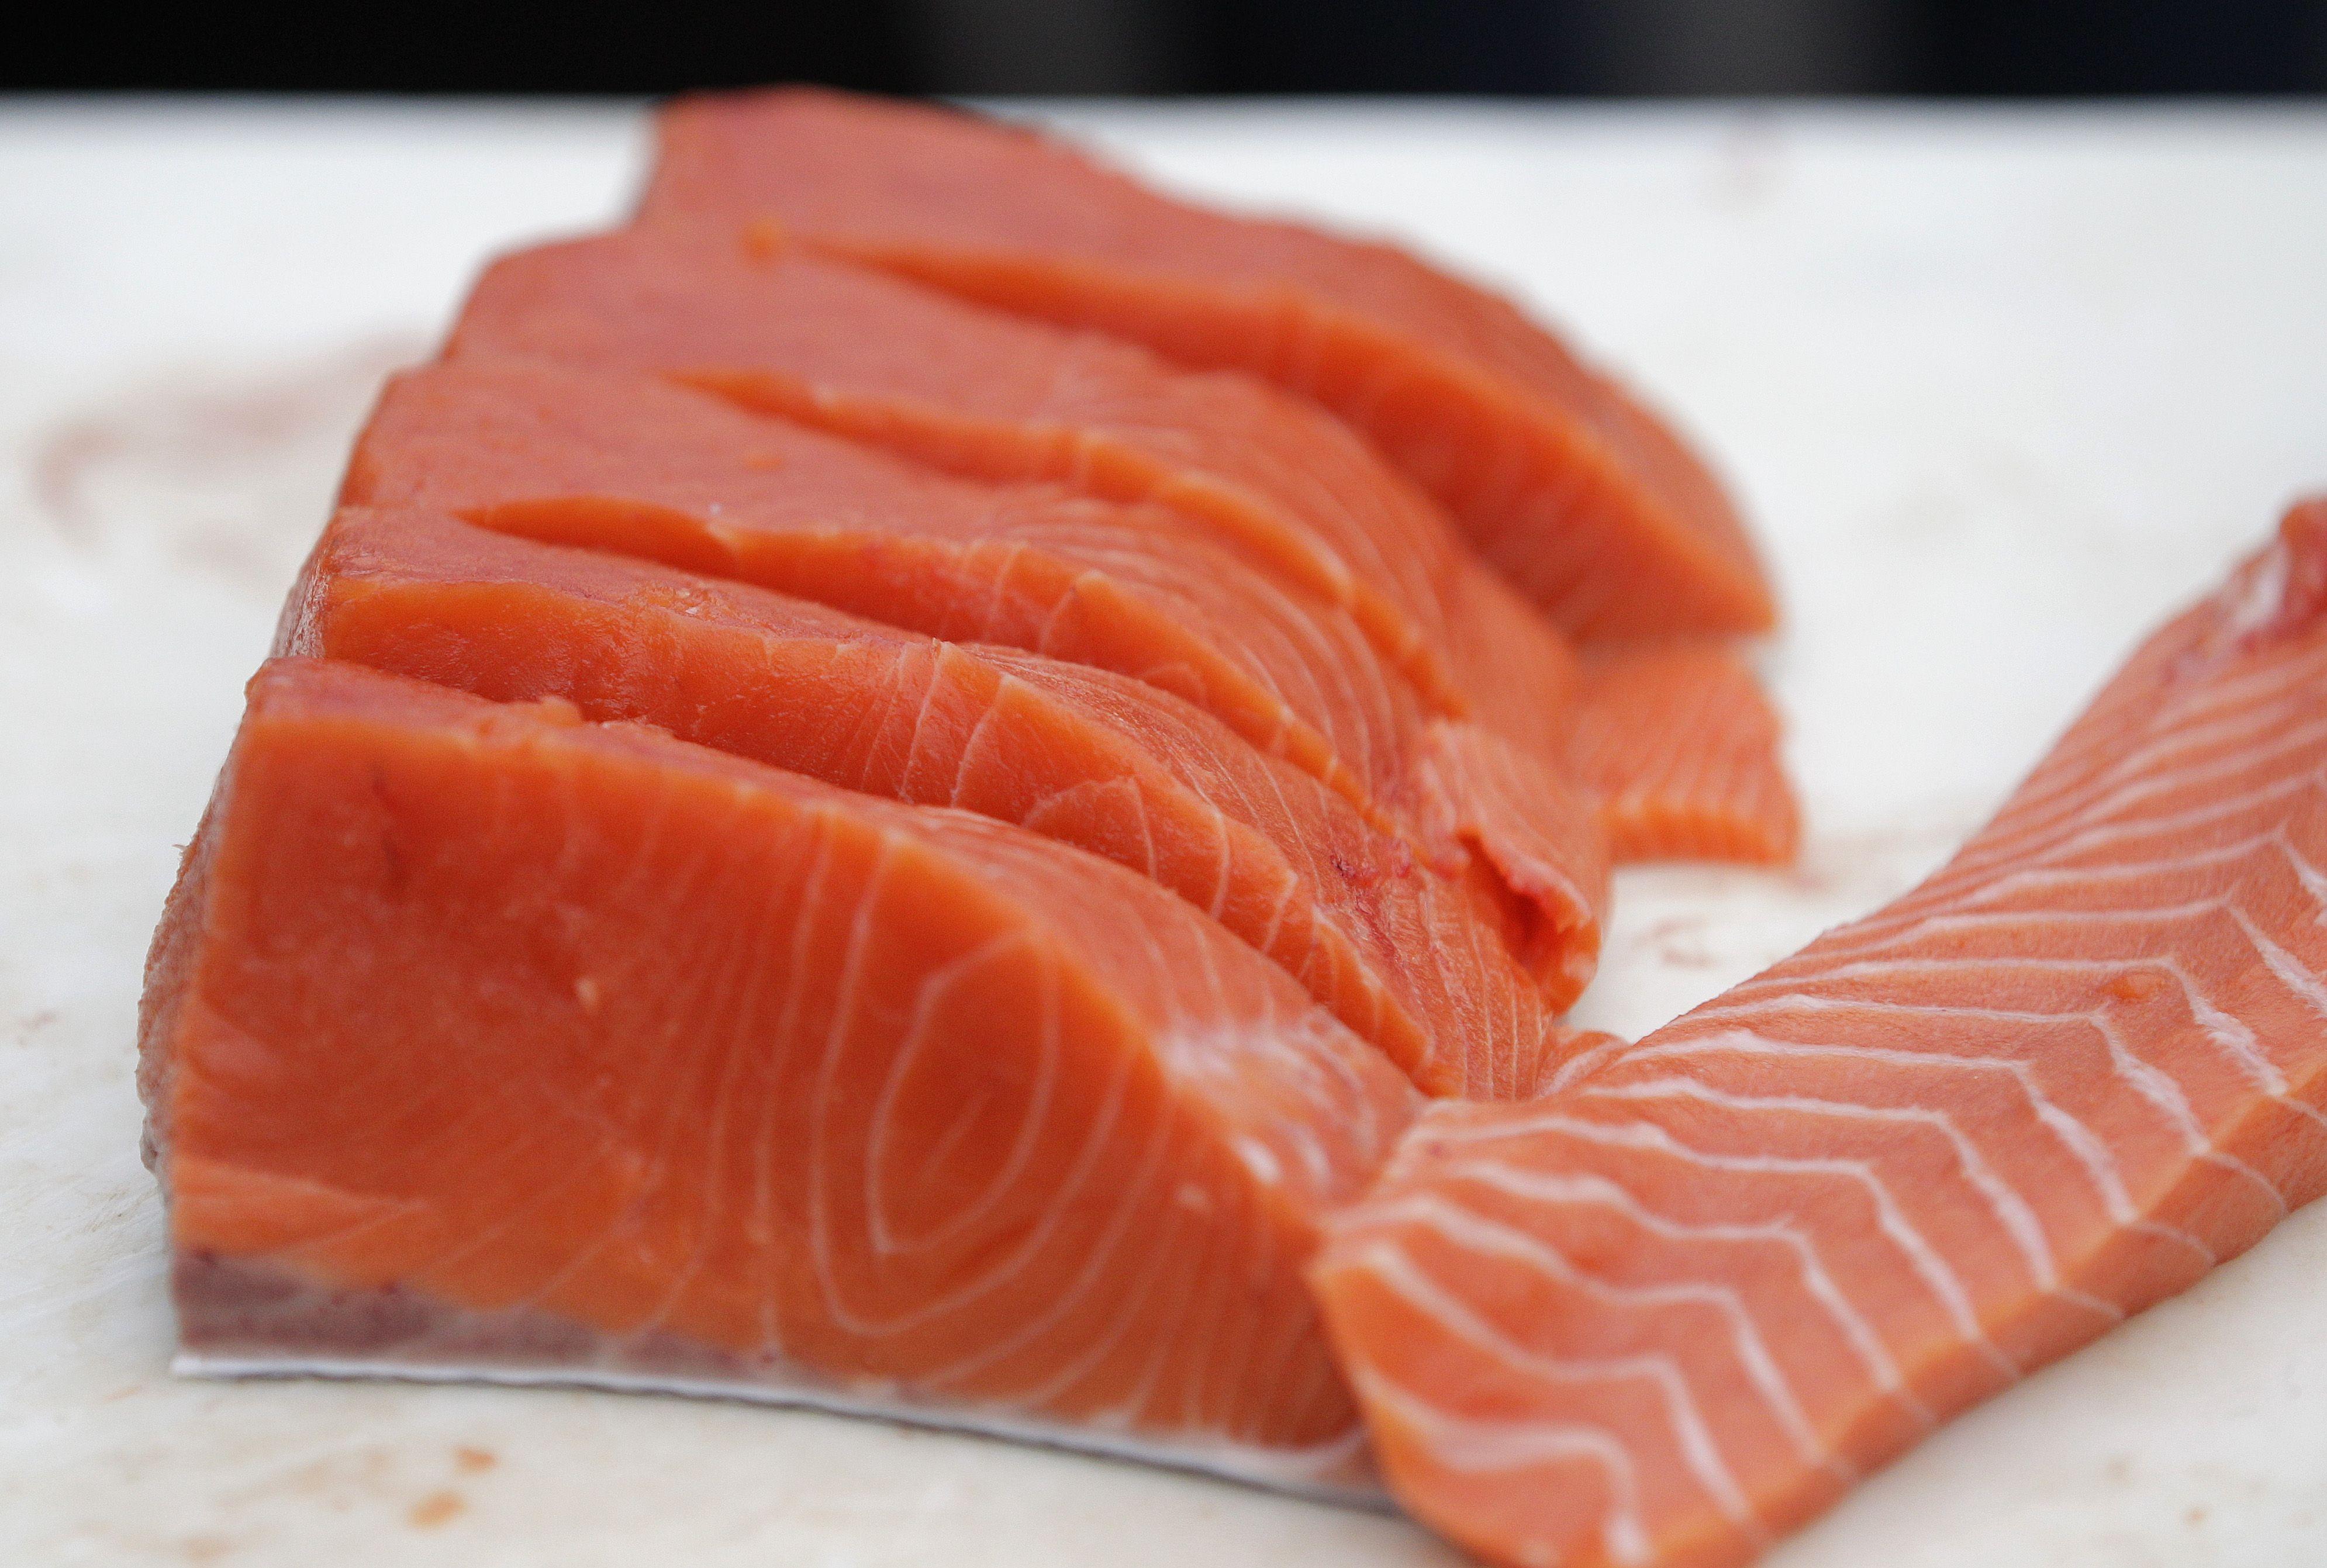 Filets of Copper River Salmon from Alaska in Seattle